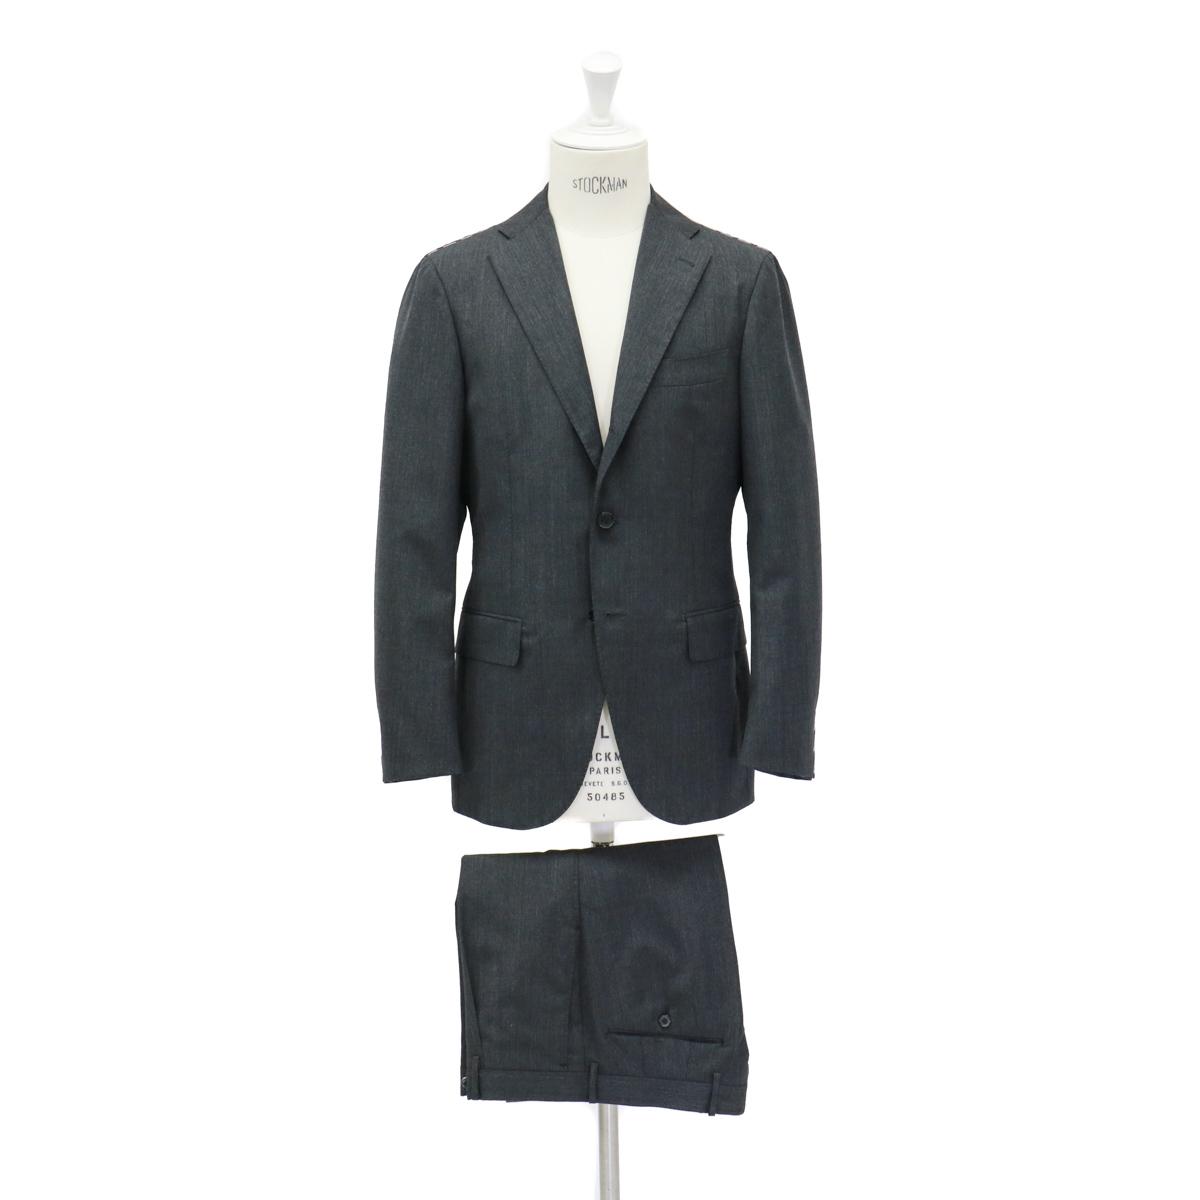 RING JACKET リングヂャケットModel No-184AH S-172HTRAVELERスーツ【チャコールグレー】